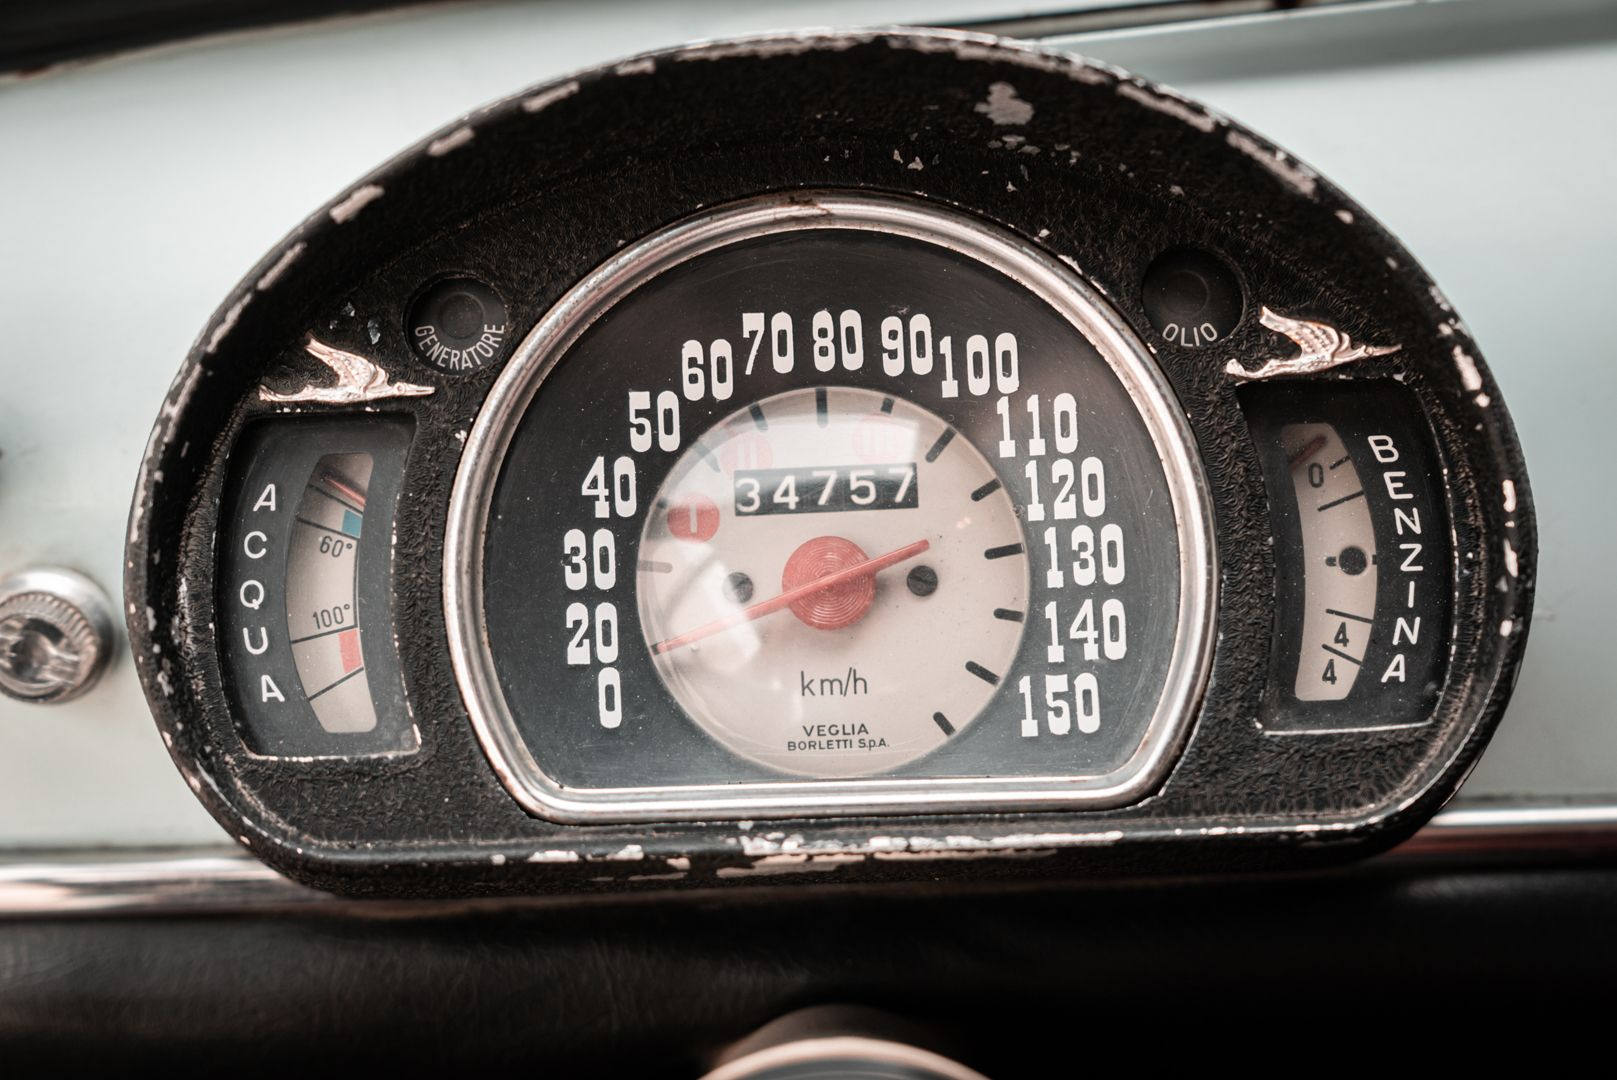 1968 Fiat Giannini 750 TV Turismo Veloce 77110